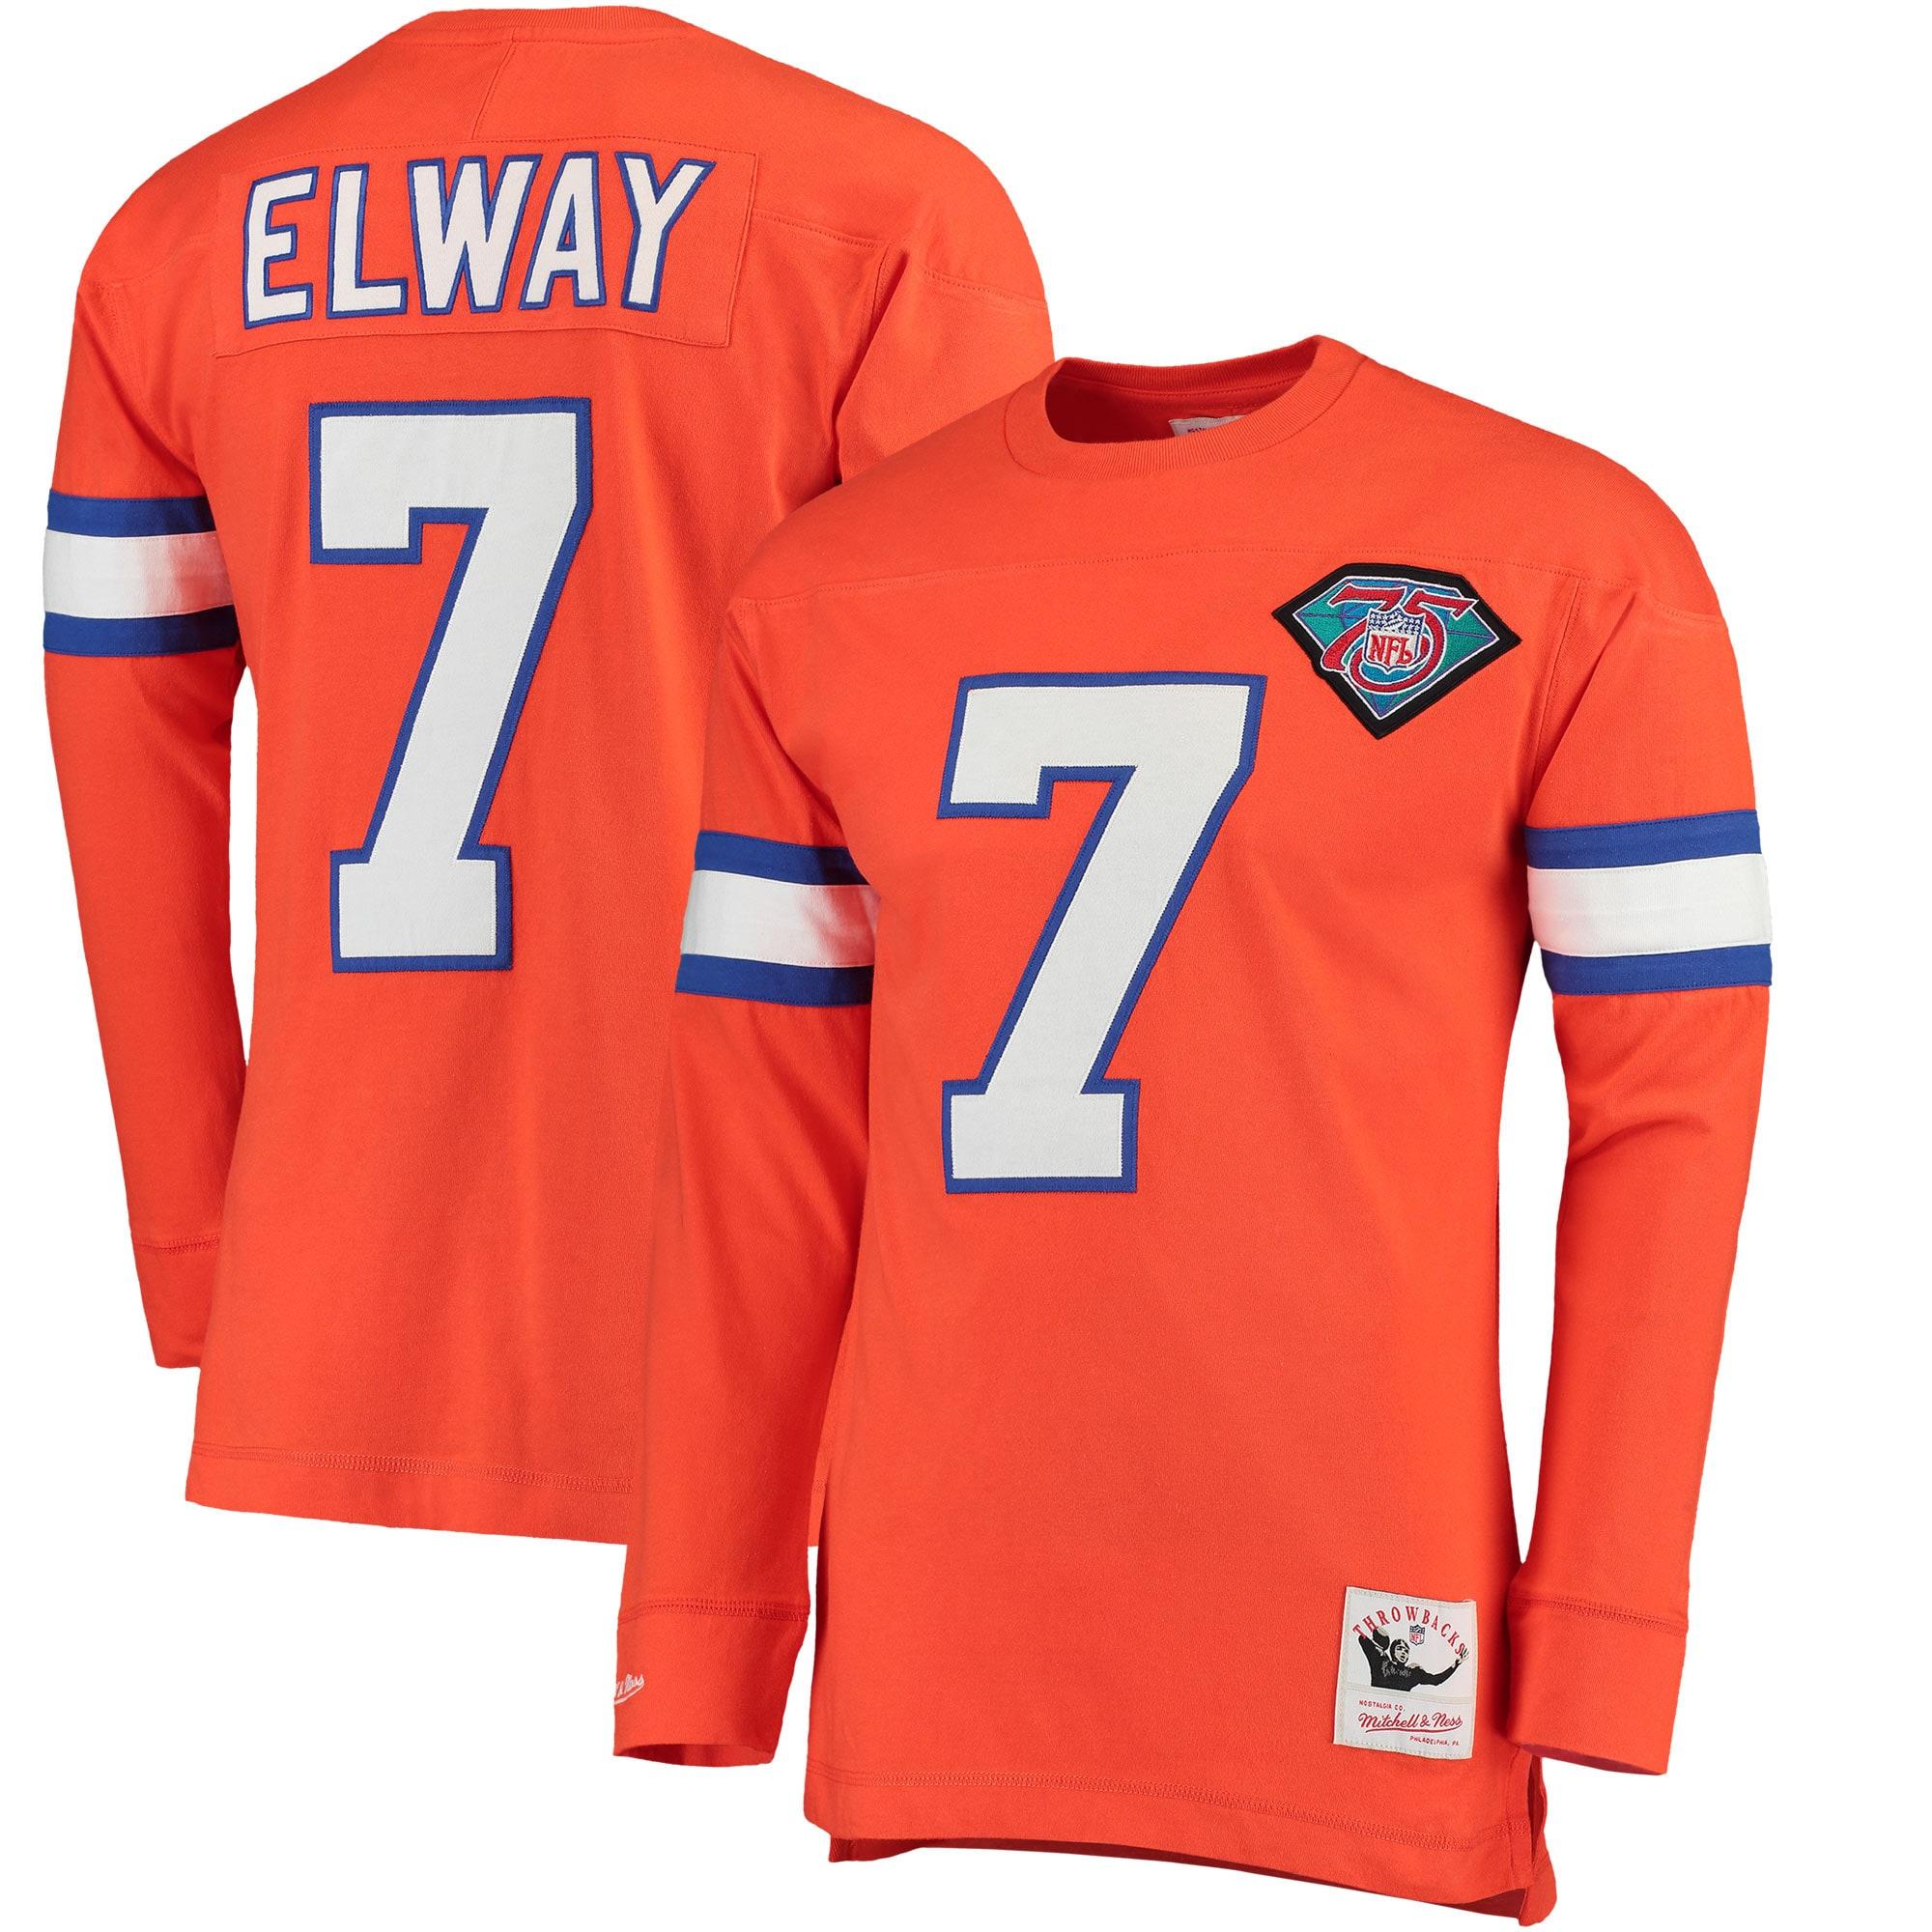 John Elway Denver Broncos Mitchell & Ness Retired Player Name & Number Long Sleeve Top - Orange